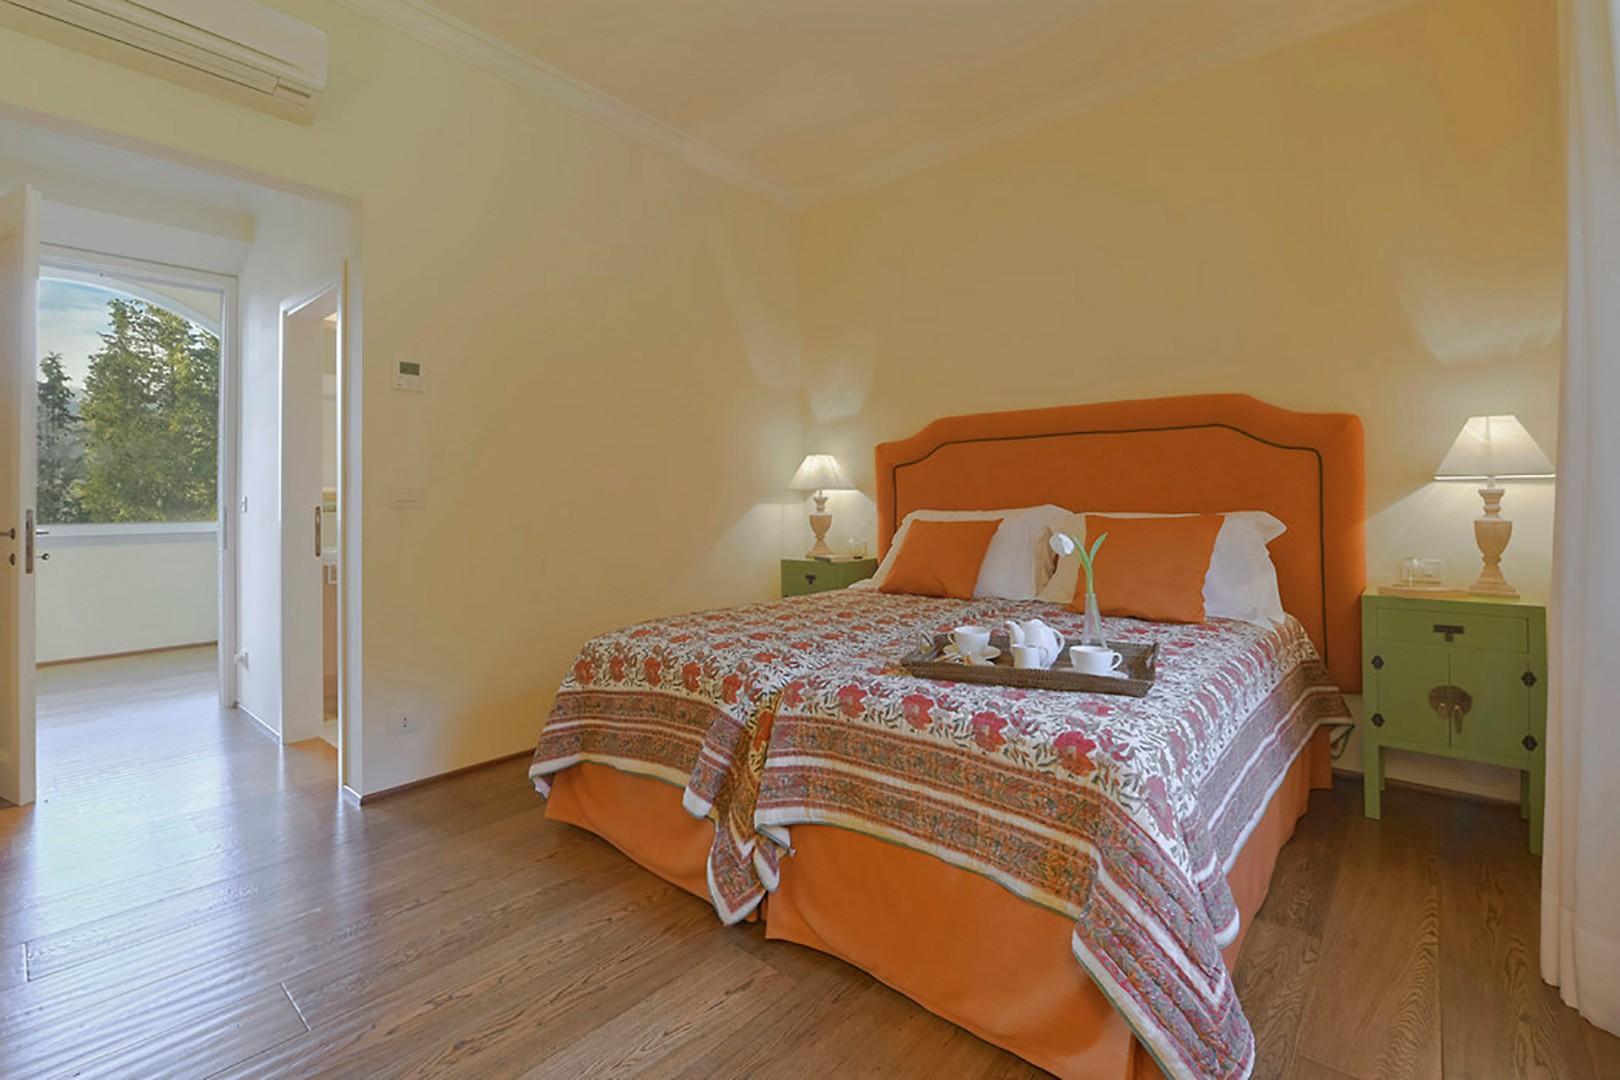 Enjoy comfortable bedroom 2 with en suite bathroom.